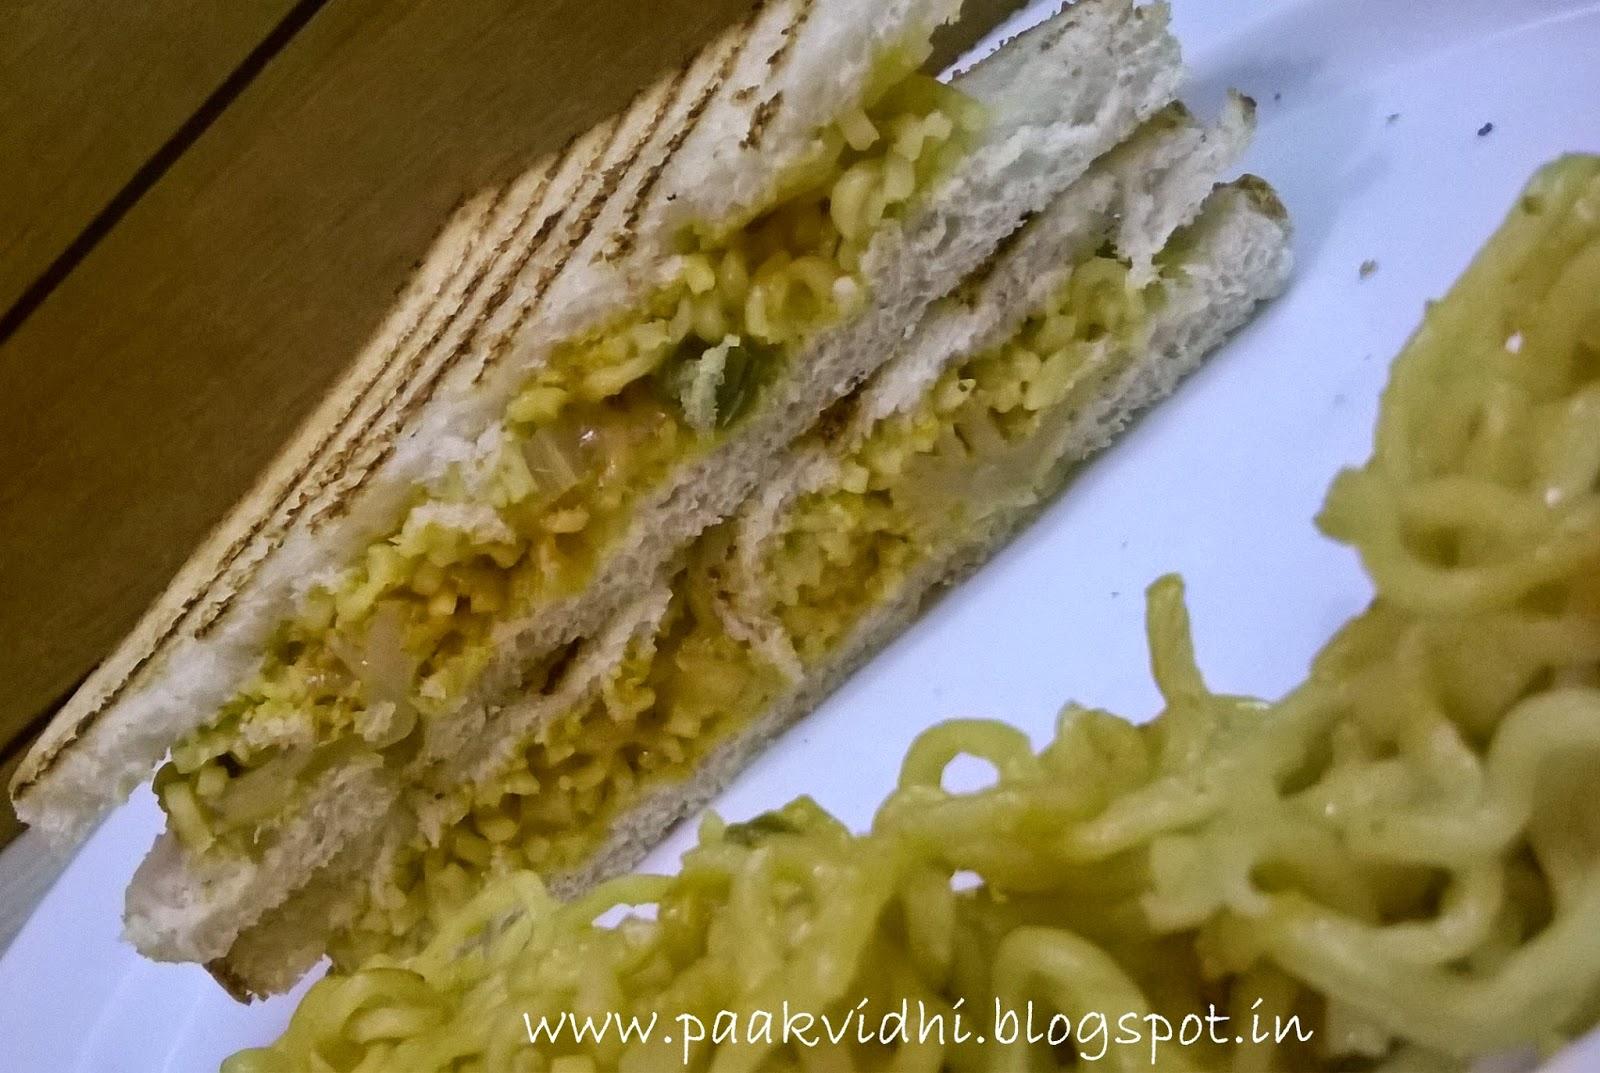 http://paakvidhi.blogspot.in/2014/09/maggi-sandwhich.html